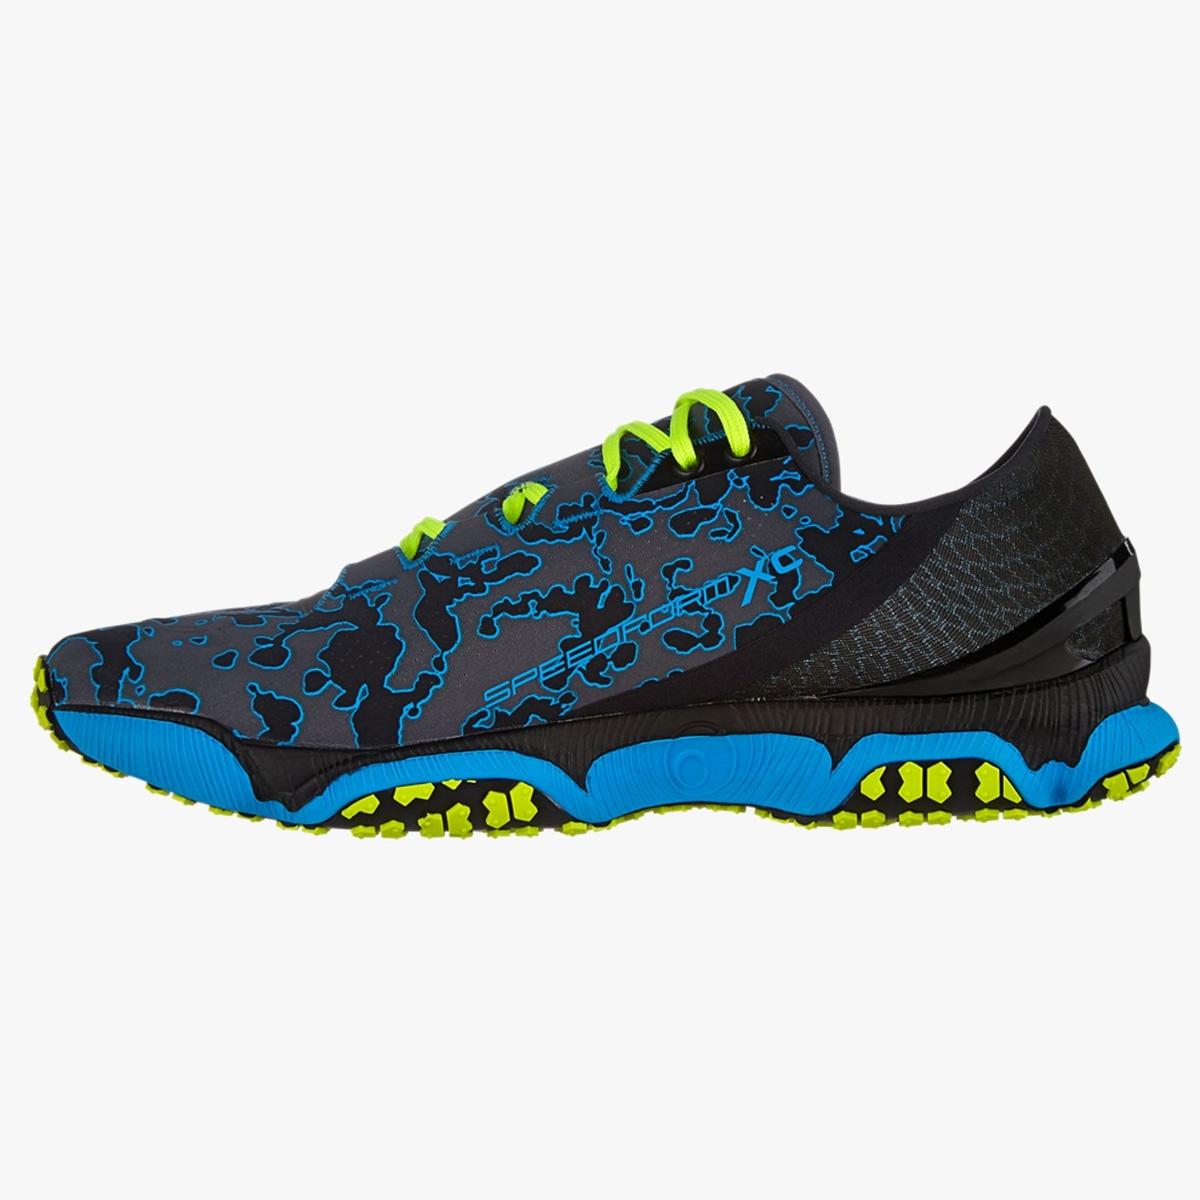 ... Image of Under Armour Speedform XC Trail Running Shoe (Men s) - Black  ... 37001acdd5fd